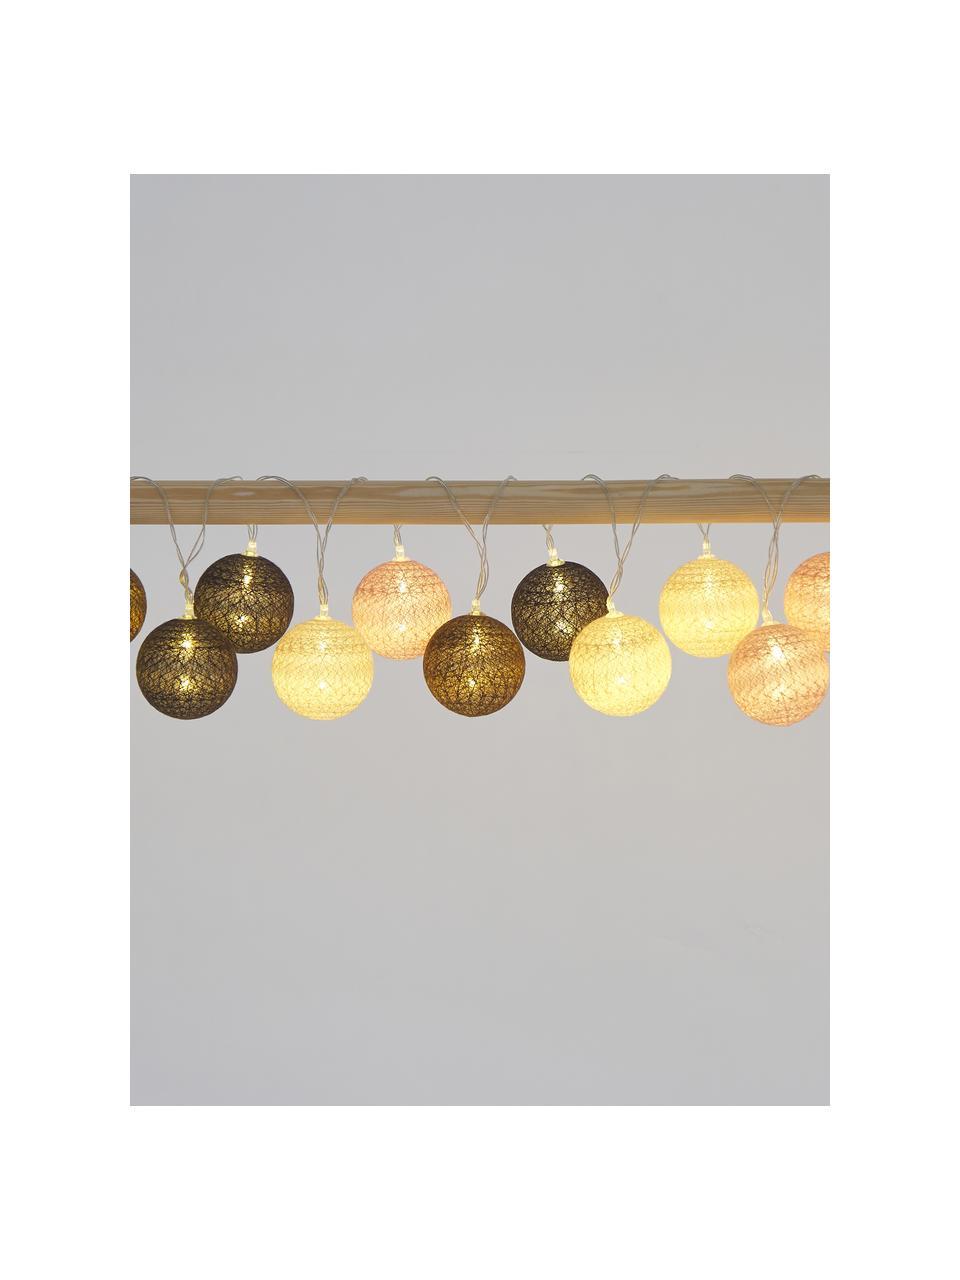 Ghirlanda  a LED Bellin, 320 cm, 20 lampioni, Lanterne: cotone, Marrone, beige, nero, rosa, Lung. 320 cm